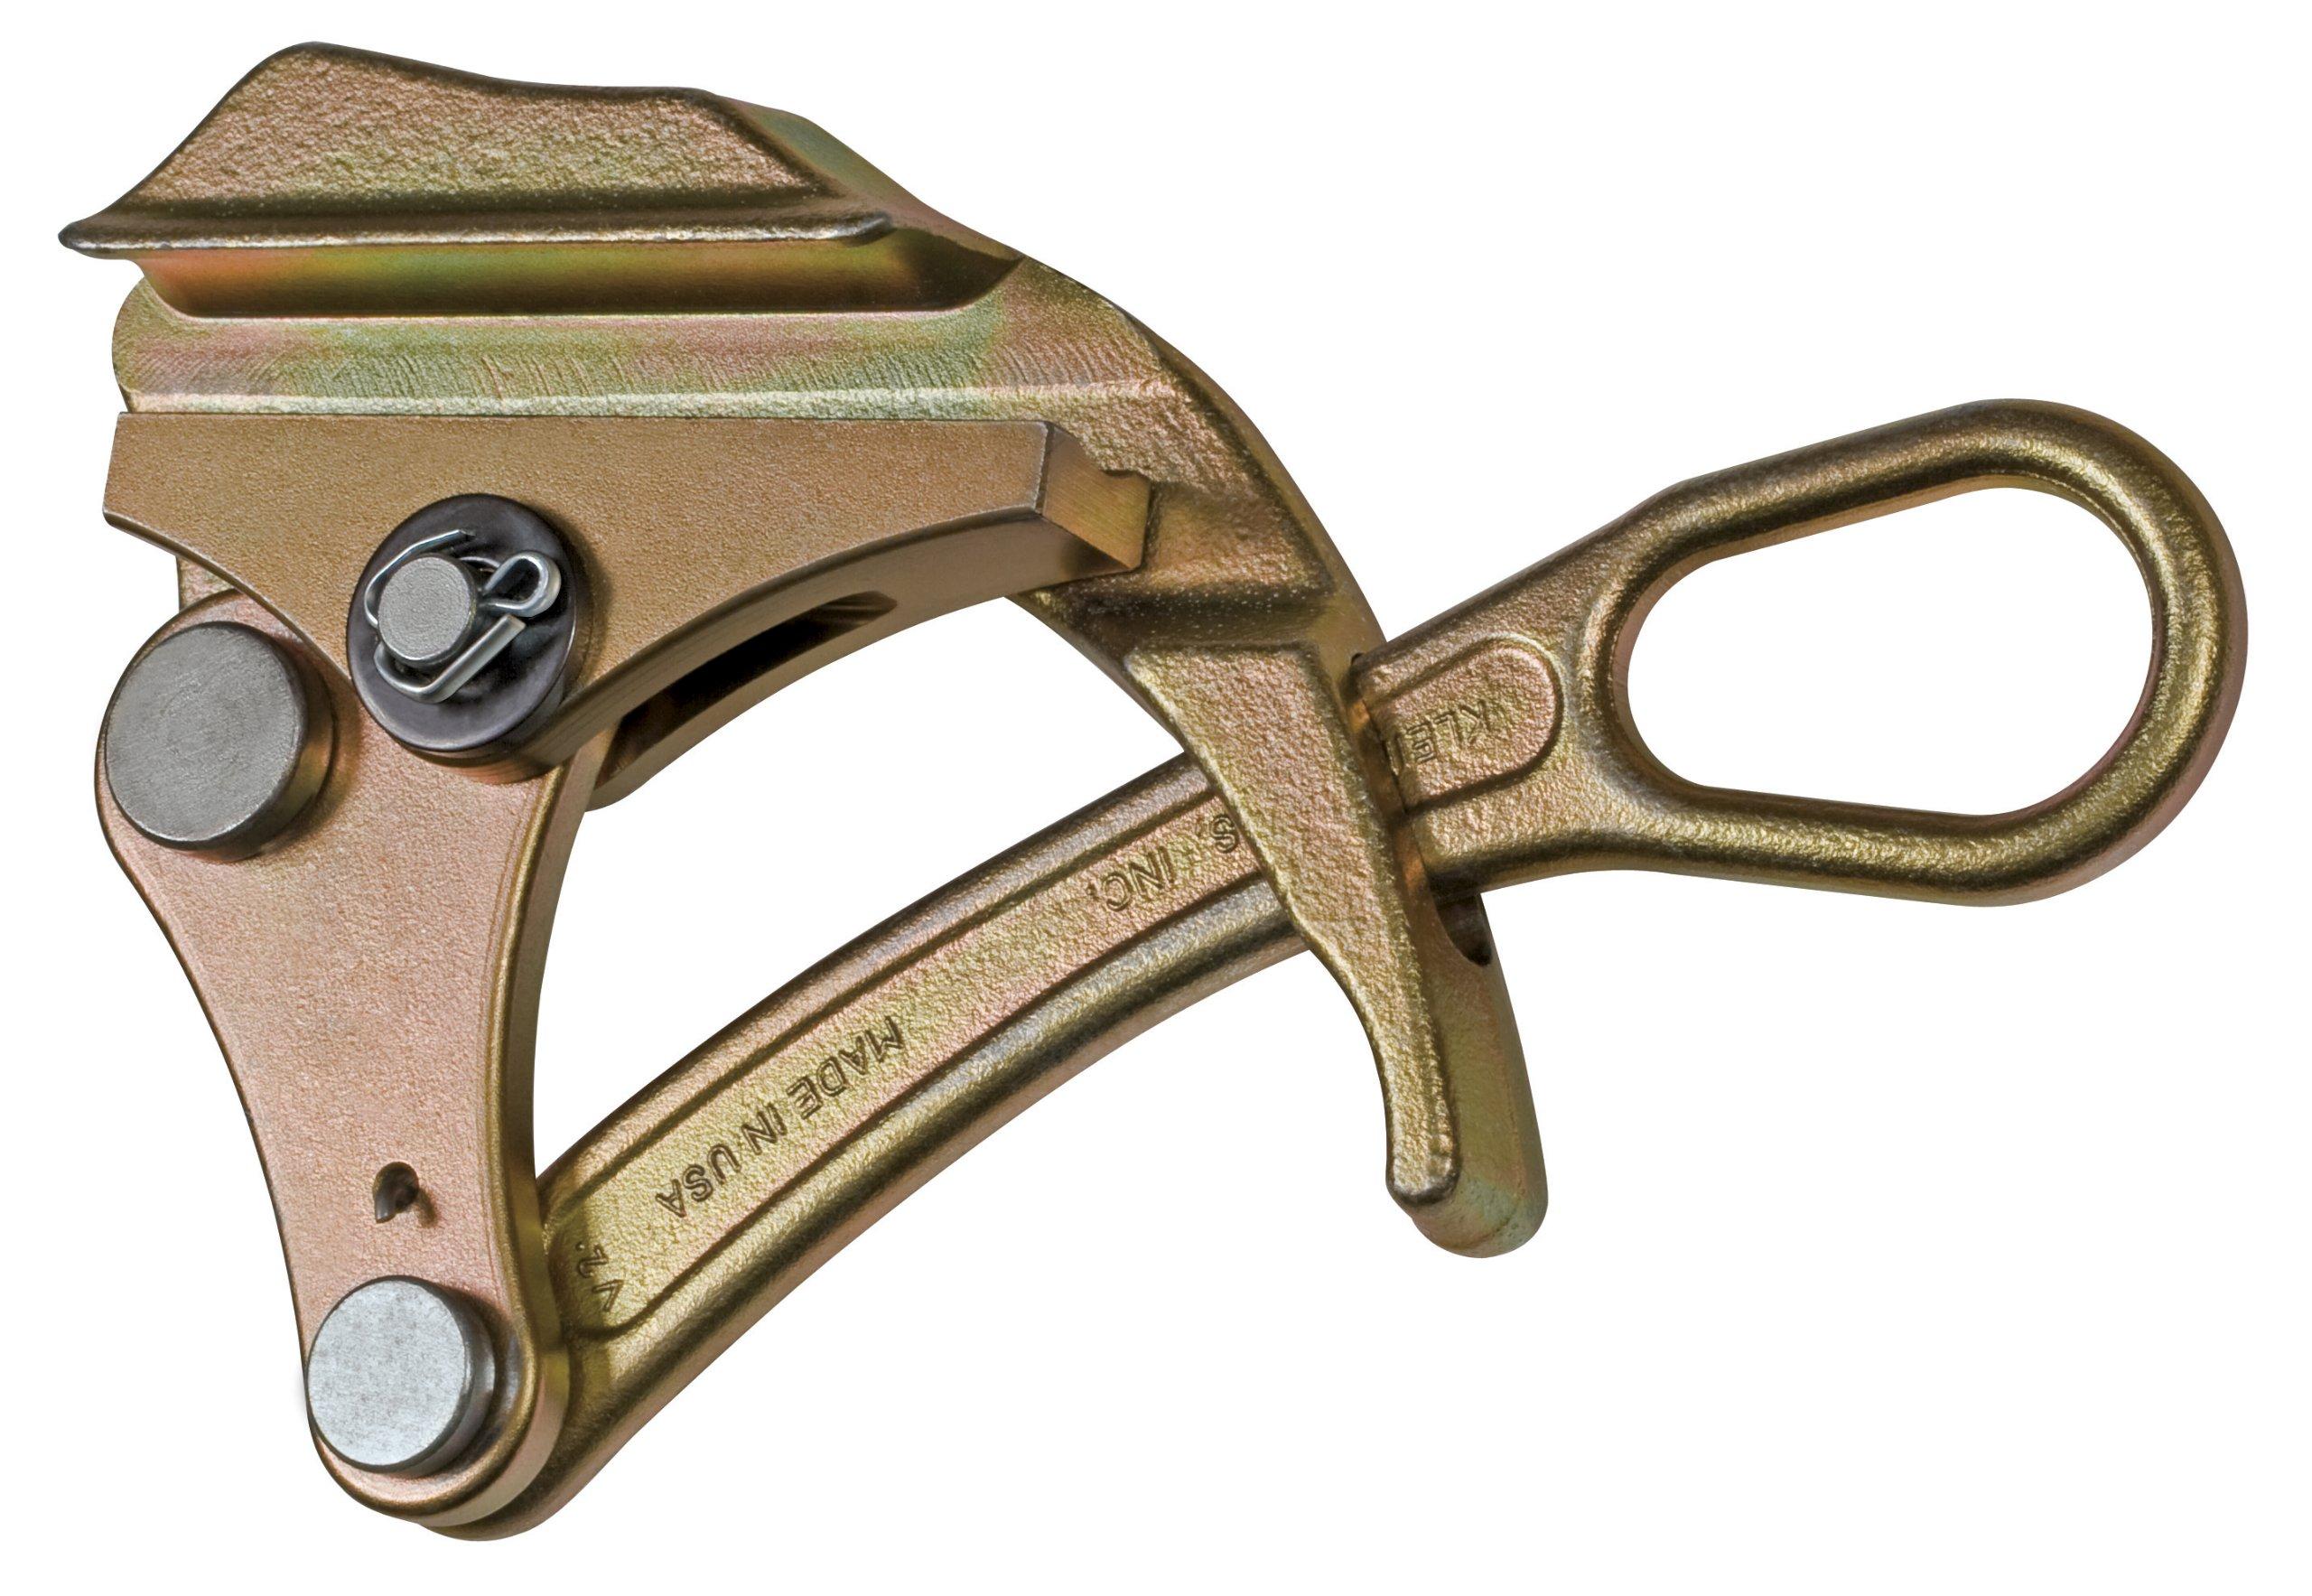 Klein Tools KT4800 Parallel Jaw Grip 4800 Series